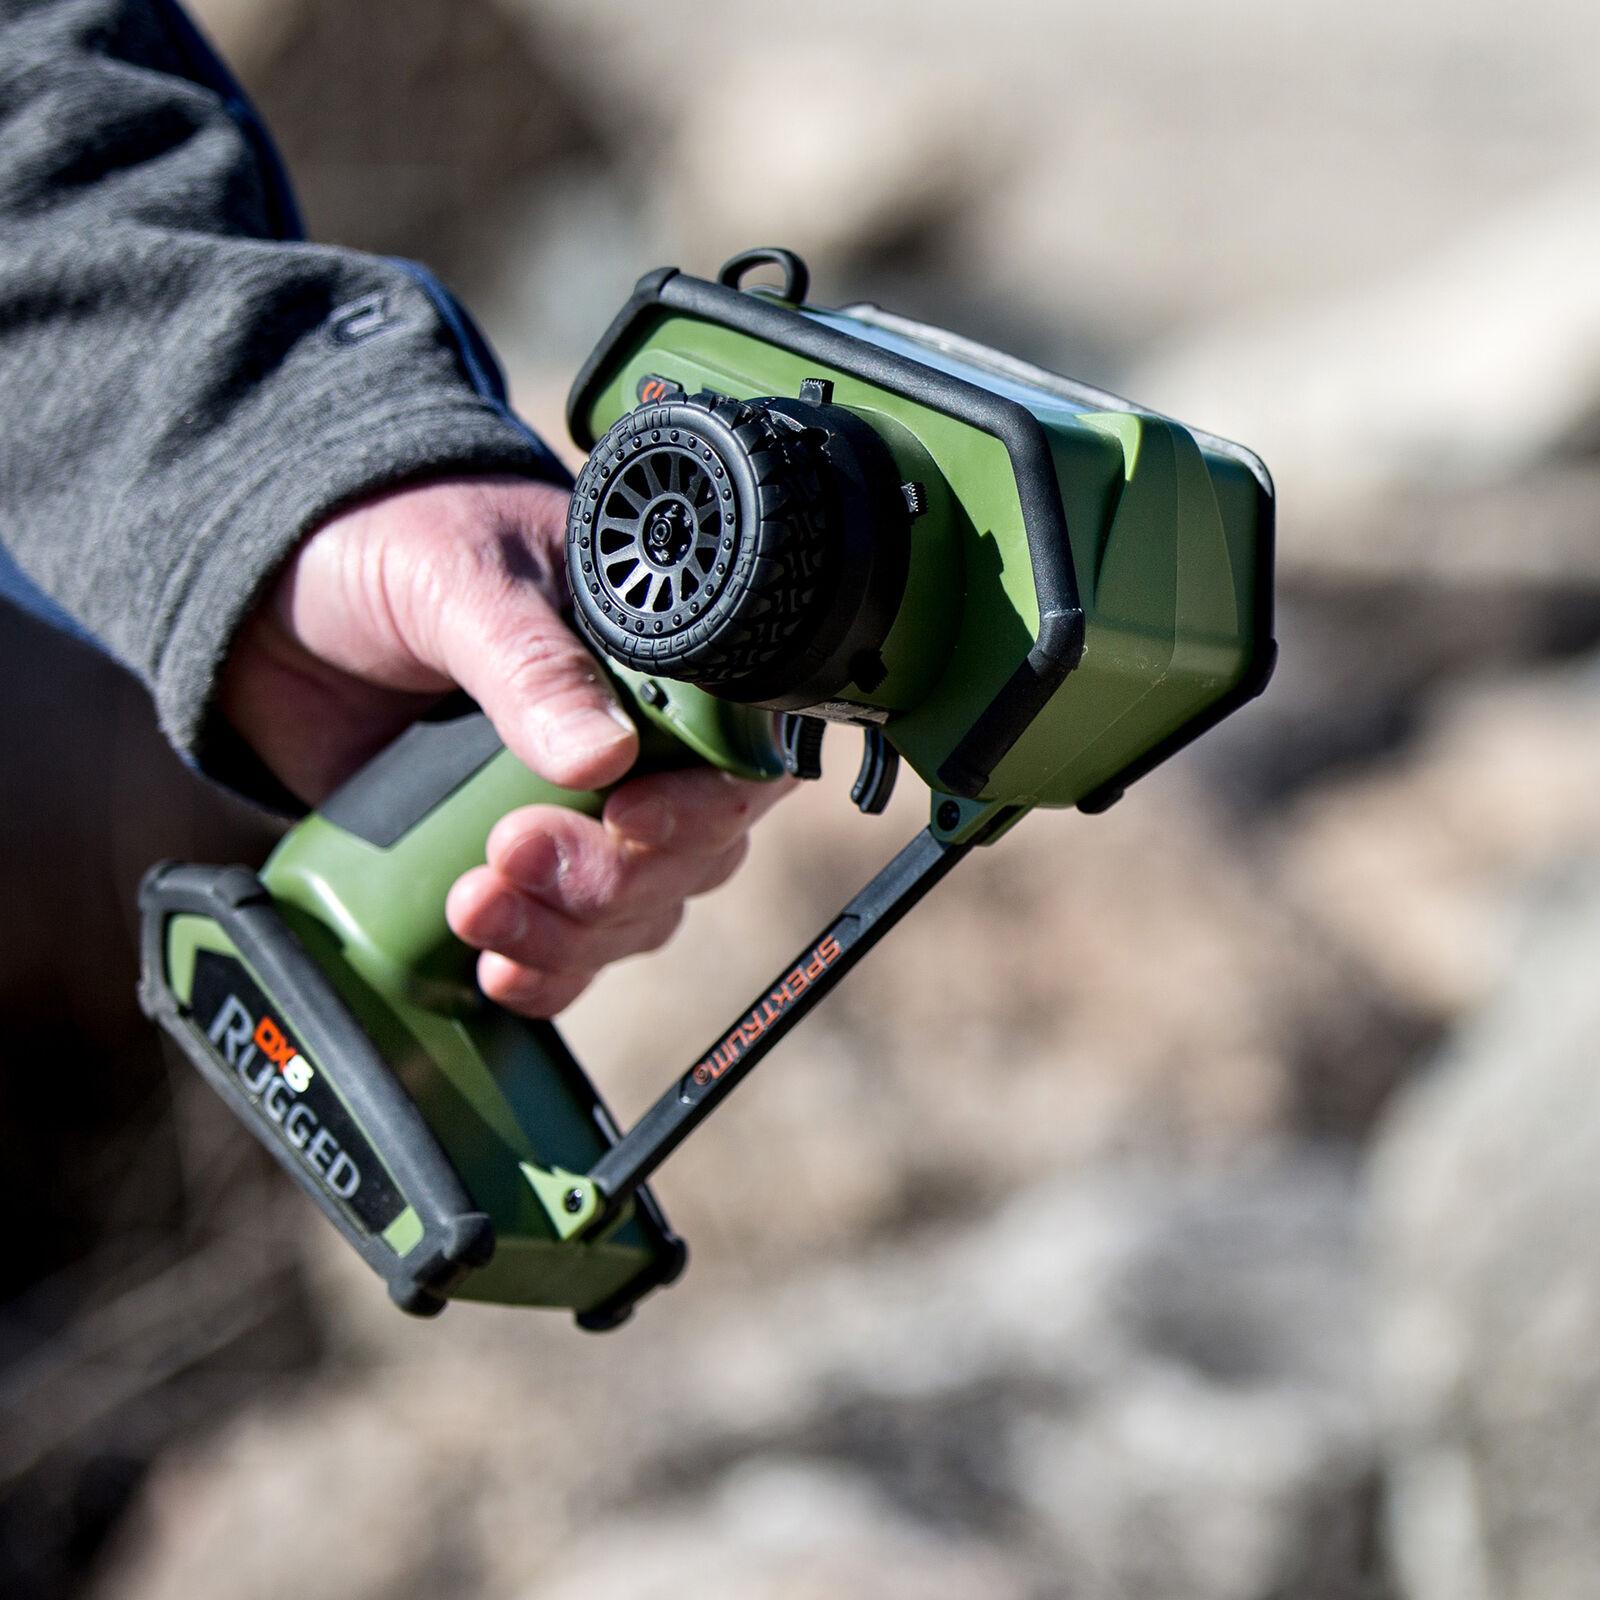 DX5 Rugged 5-Channel DSMR Transmitter Only, Green